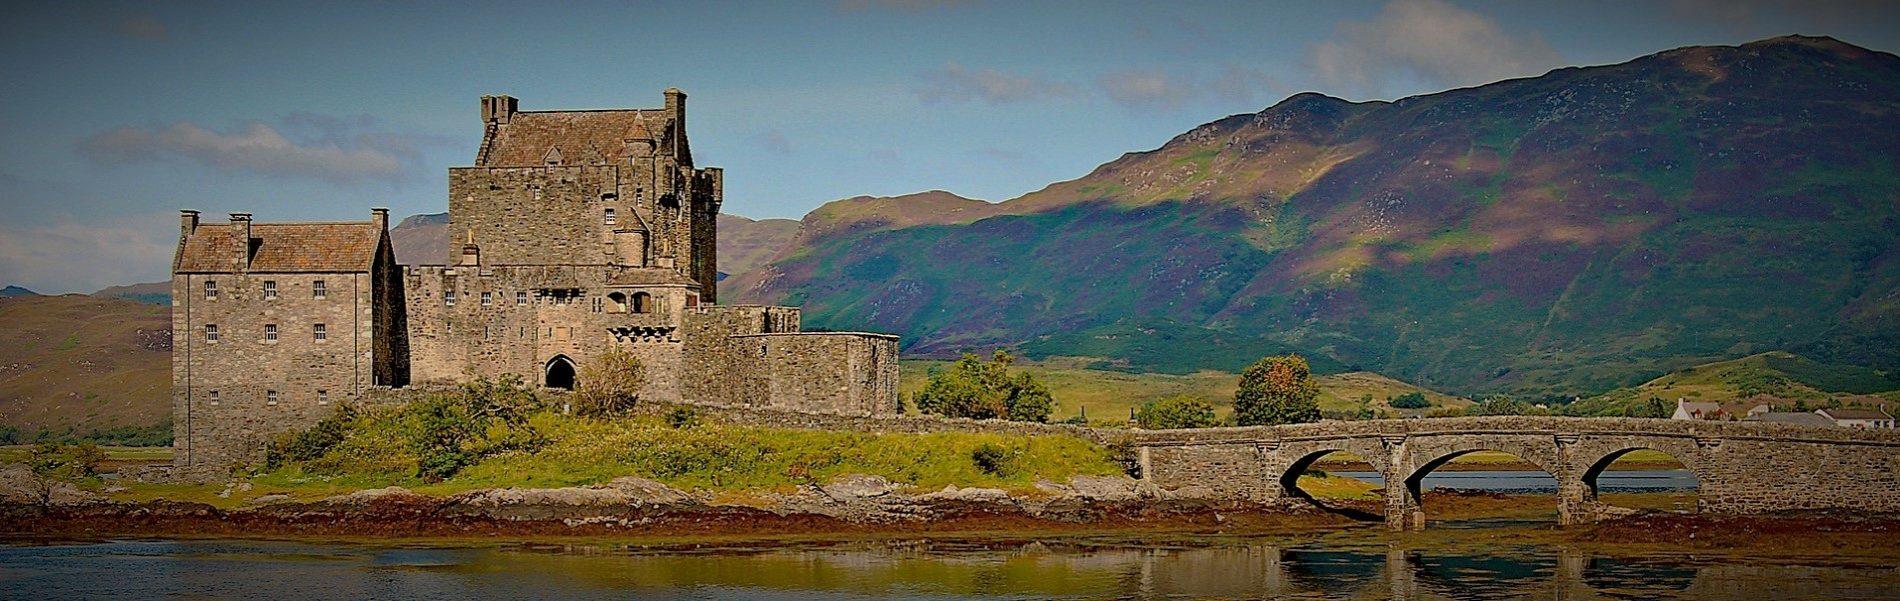 Scotland Tours - Eilean Donan